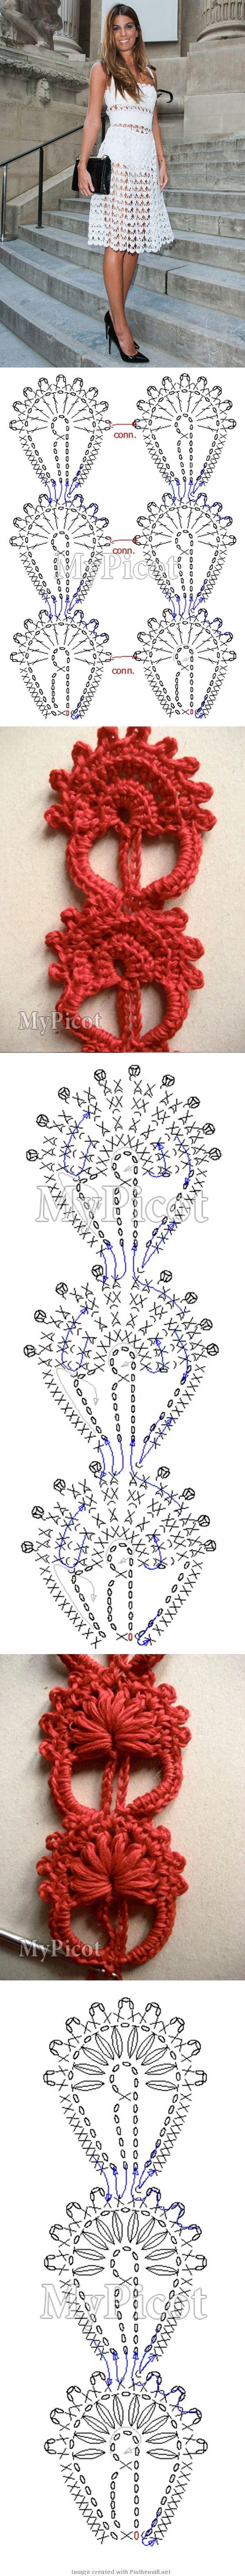 dolce & gabbana crochet dress - photo tutorial & charts - lovely: